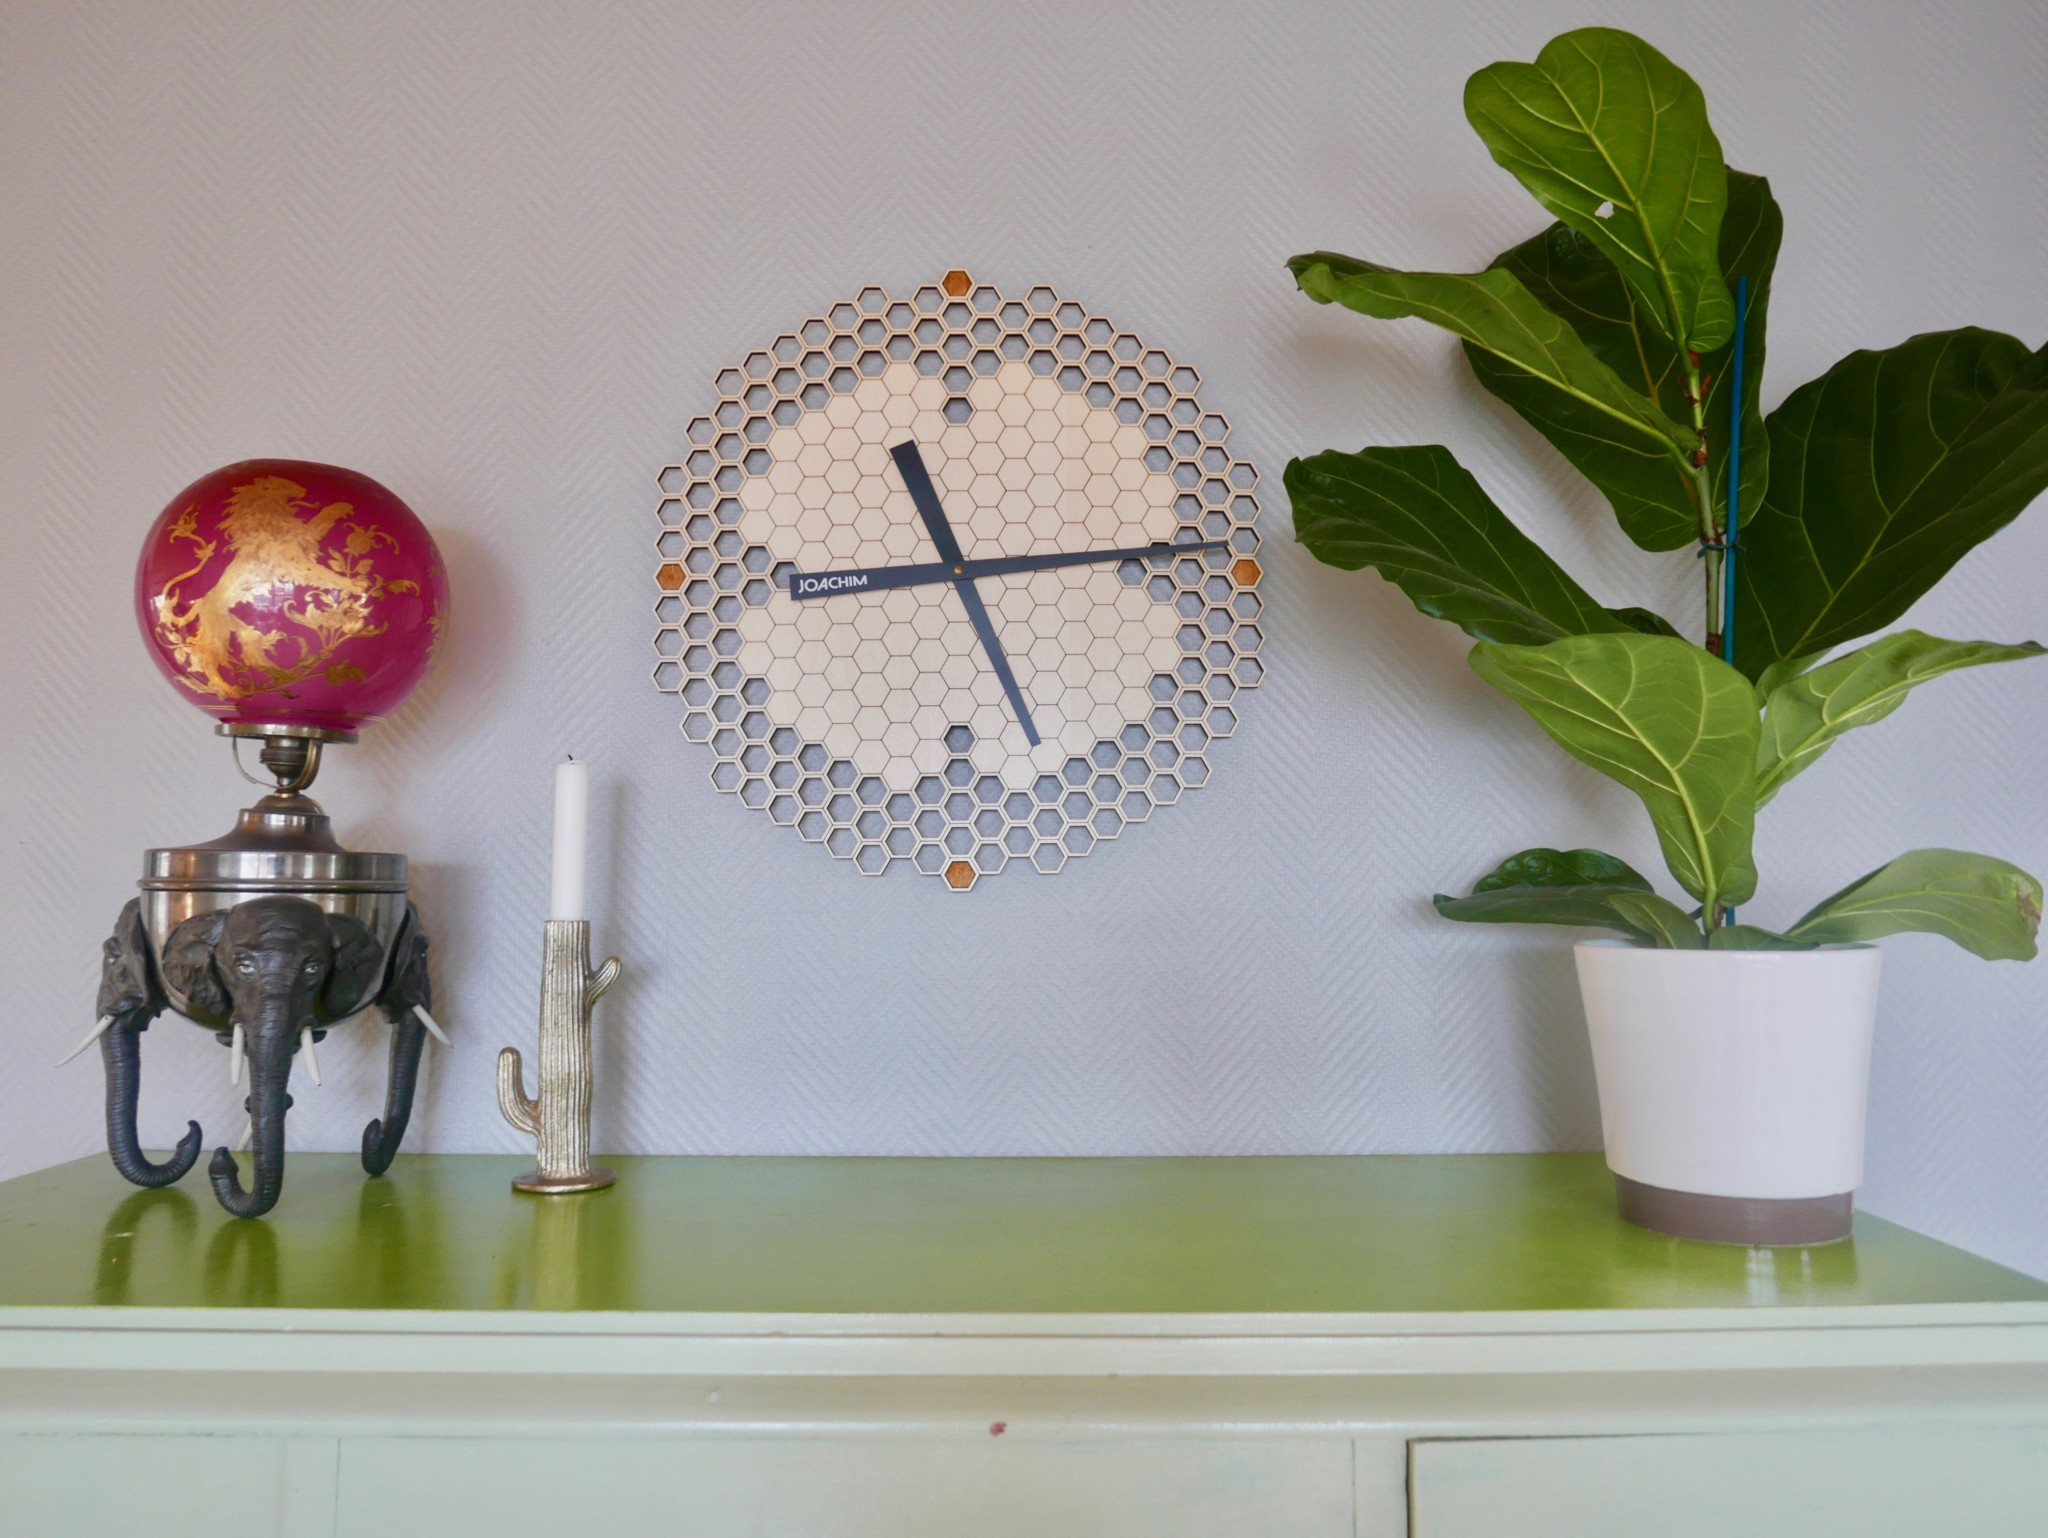 anja-stang-joachim-clocks-plant-the-planet